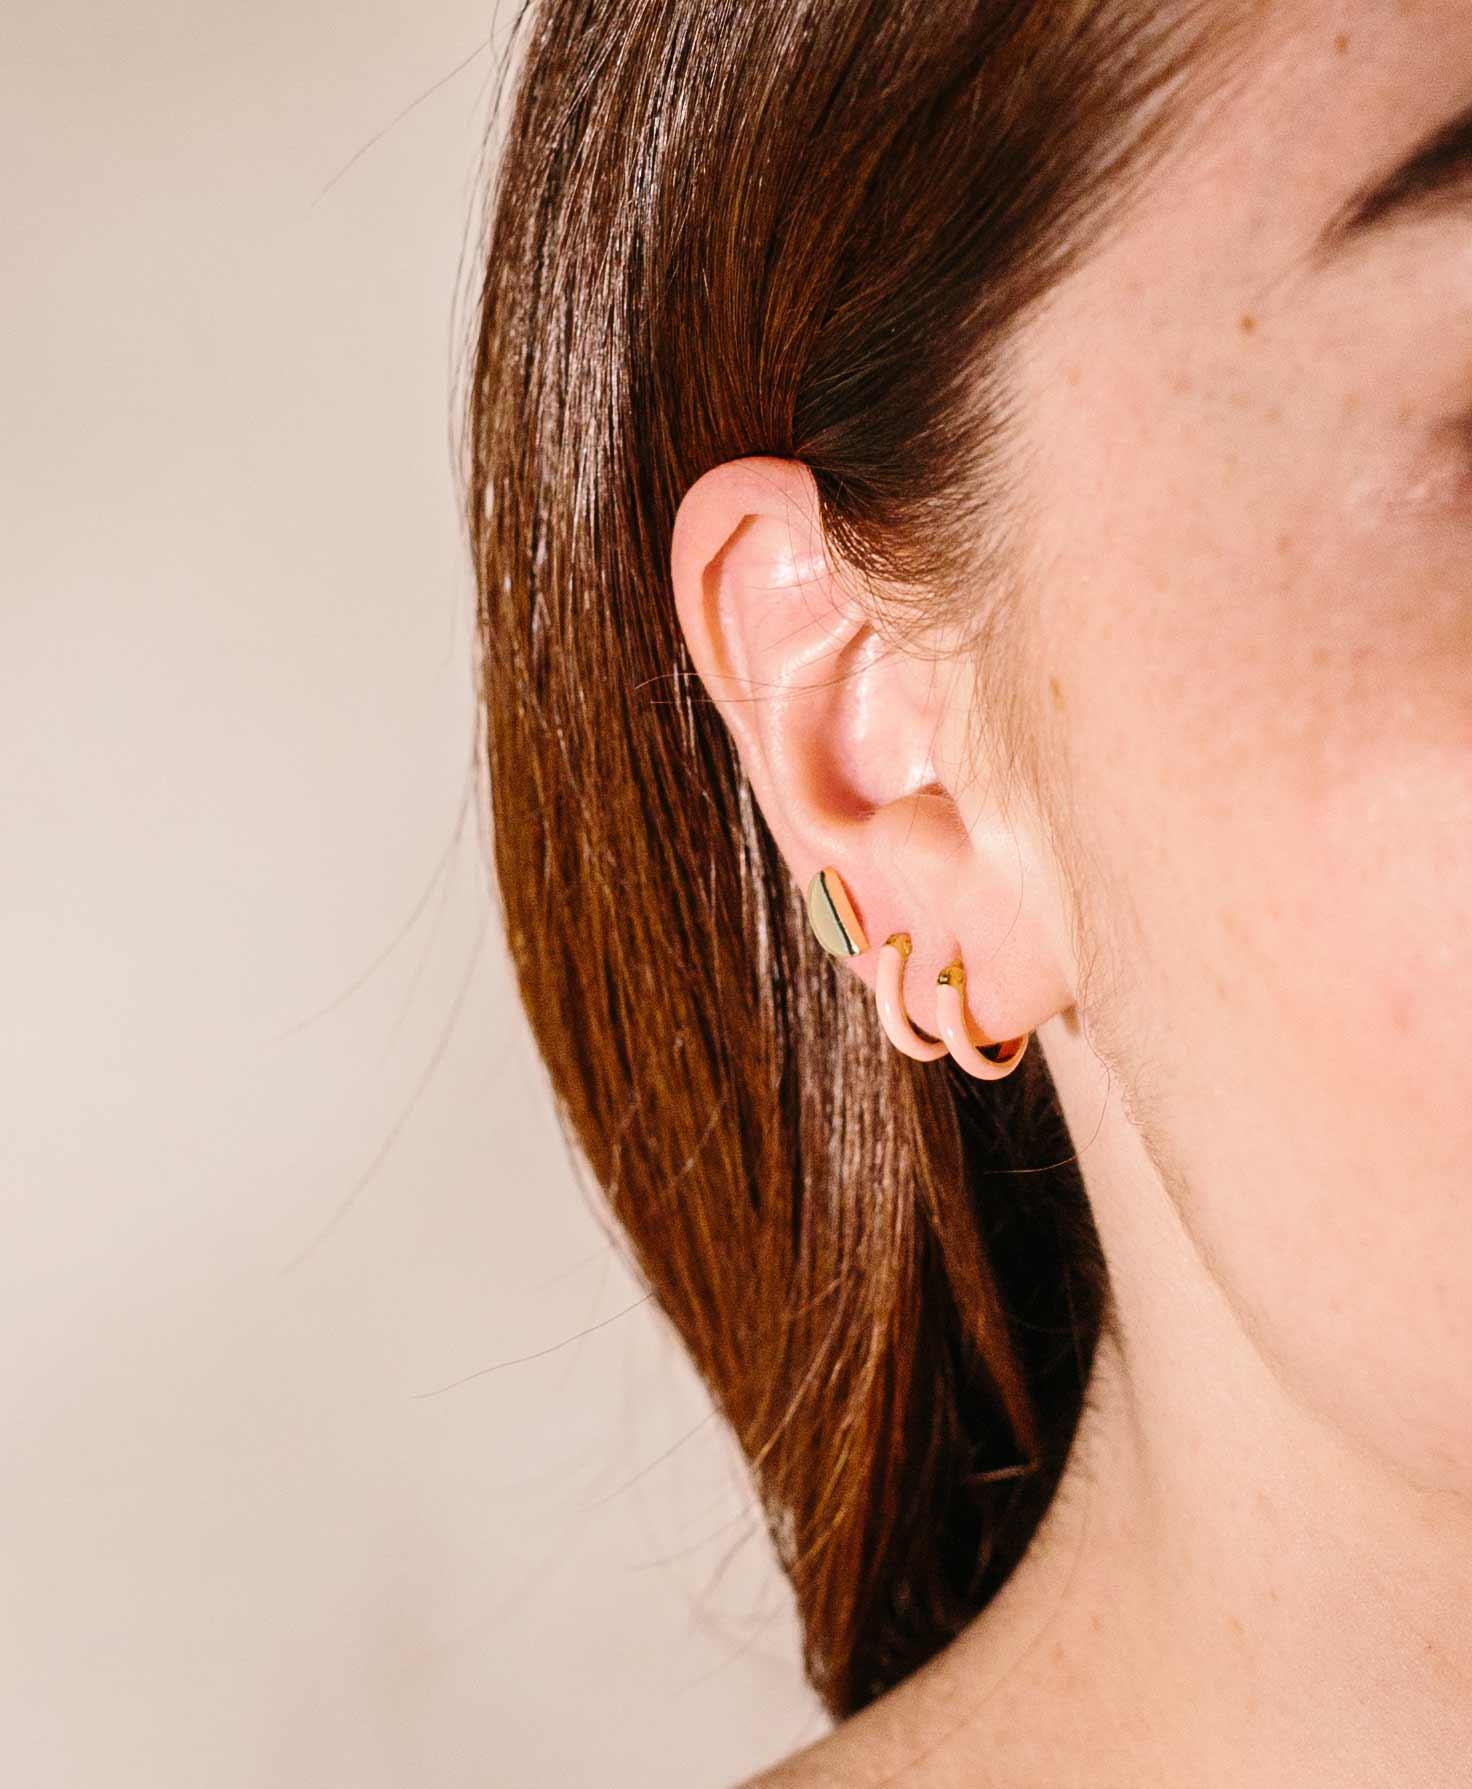 Half of a model's face is shown. On her ear, she wears three dainty hoop earrings. She wears two Golden Hour Hoop earrings on her lobe, and a simple golden halfmoon earring further up her ear.